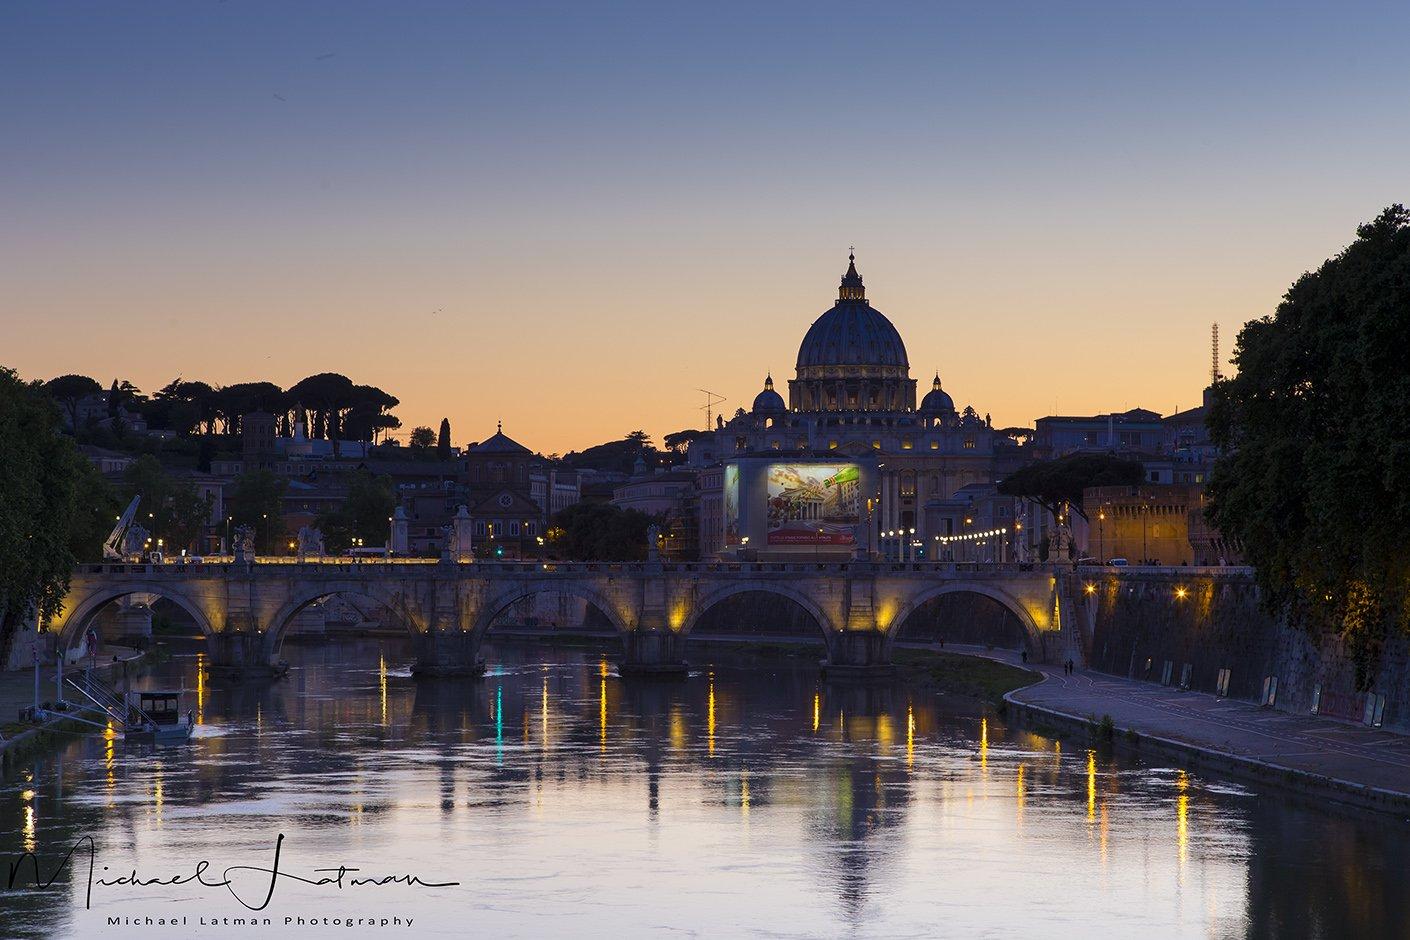 city, rome, spring,, Michael Latman